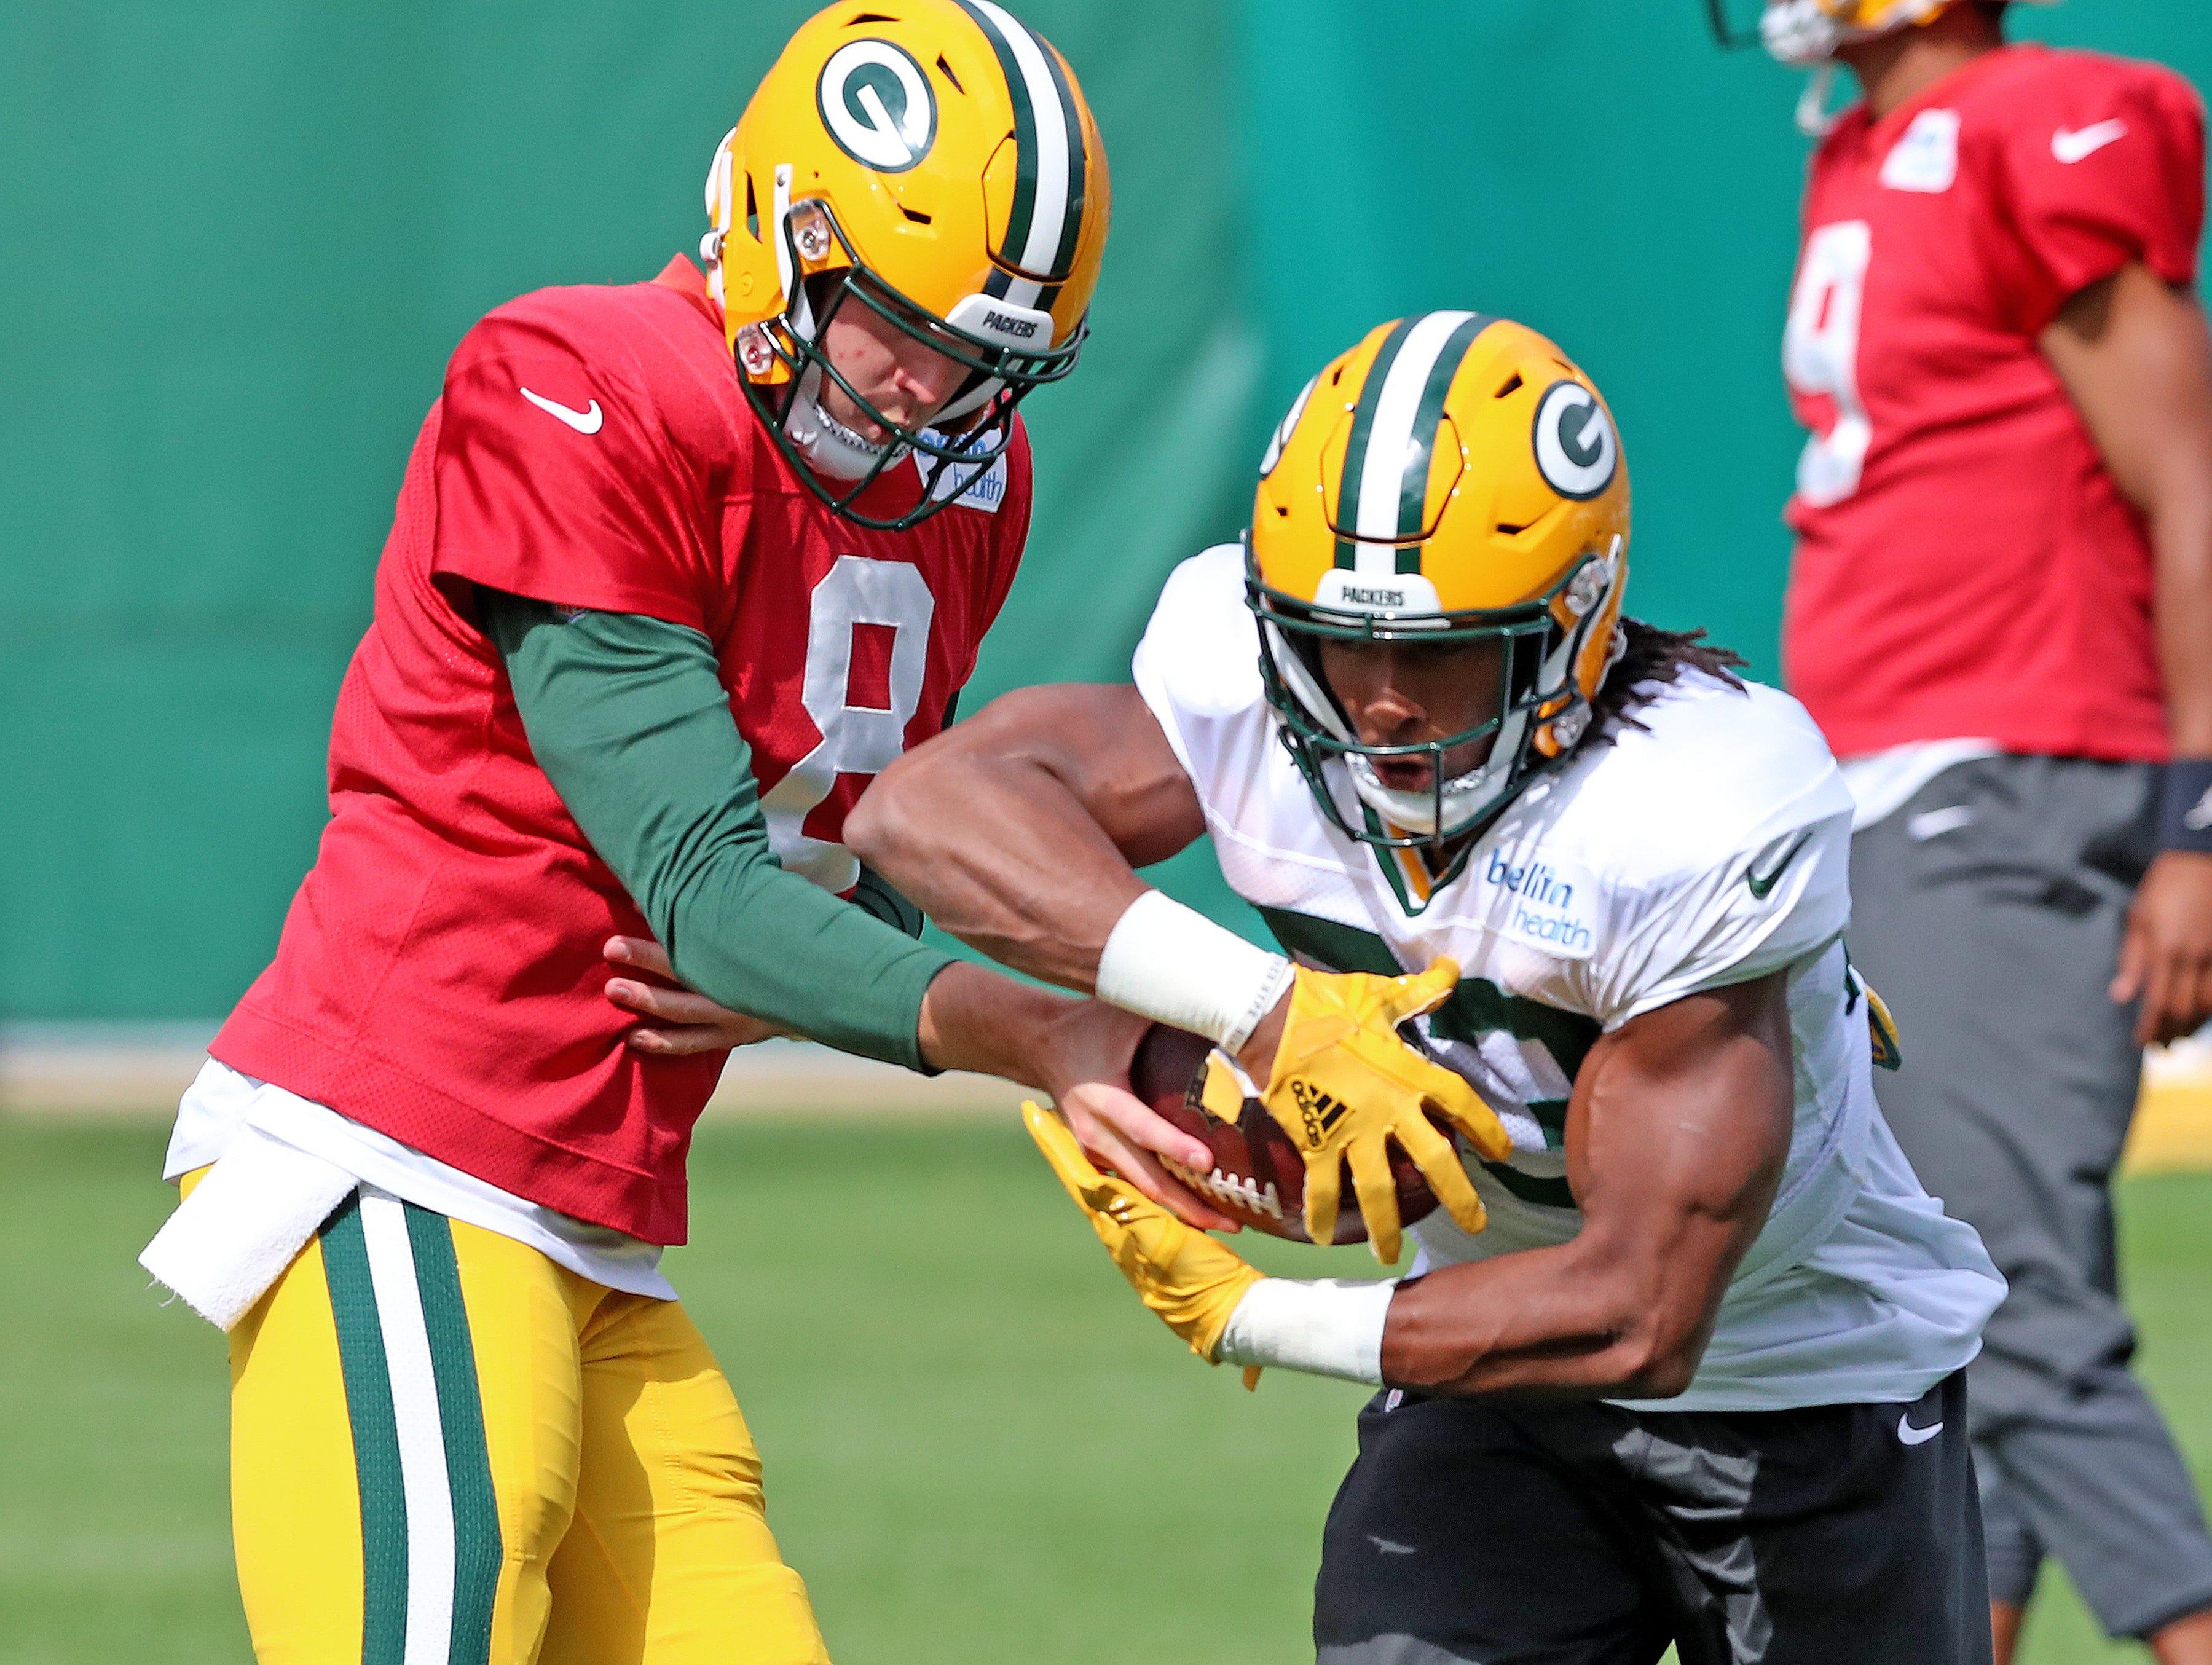 Green Bay Packers quarterback Tim Boyle (8) hands off to running back Aaron Jones (33) during practice on Clarke Hinkle Field Thursday, September 27, 2018 in Ashwaubenon, Wis